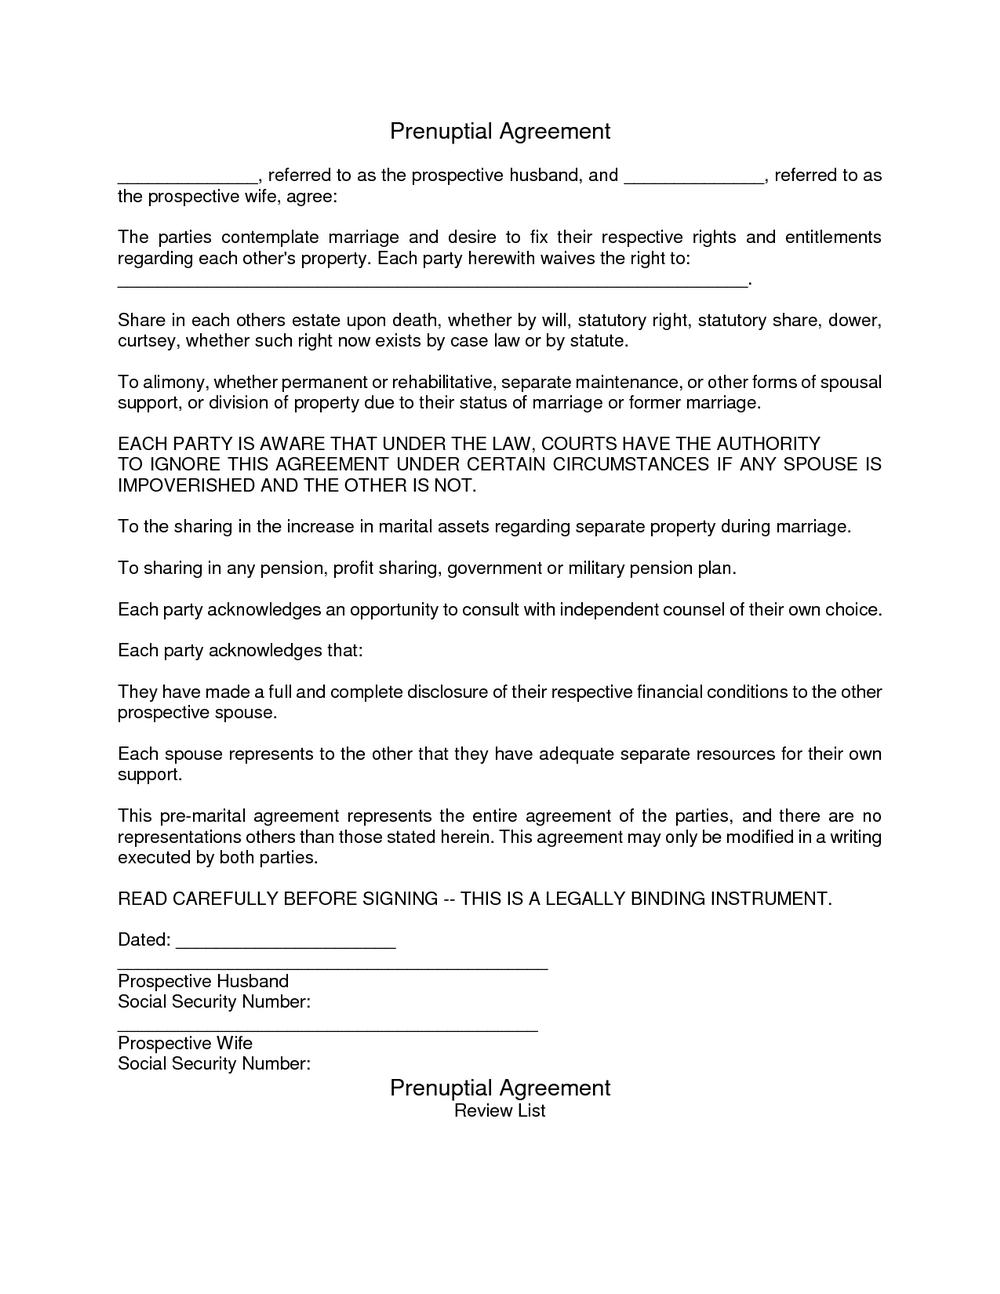 Prenuptial Agreement Form Florida Universal Network